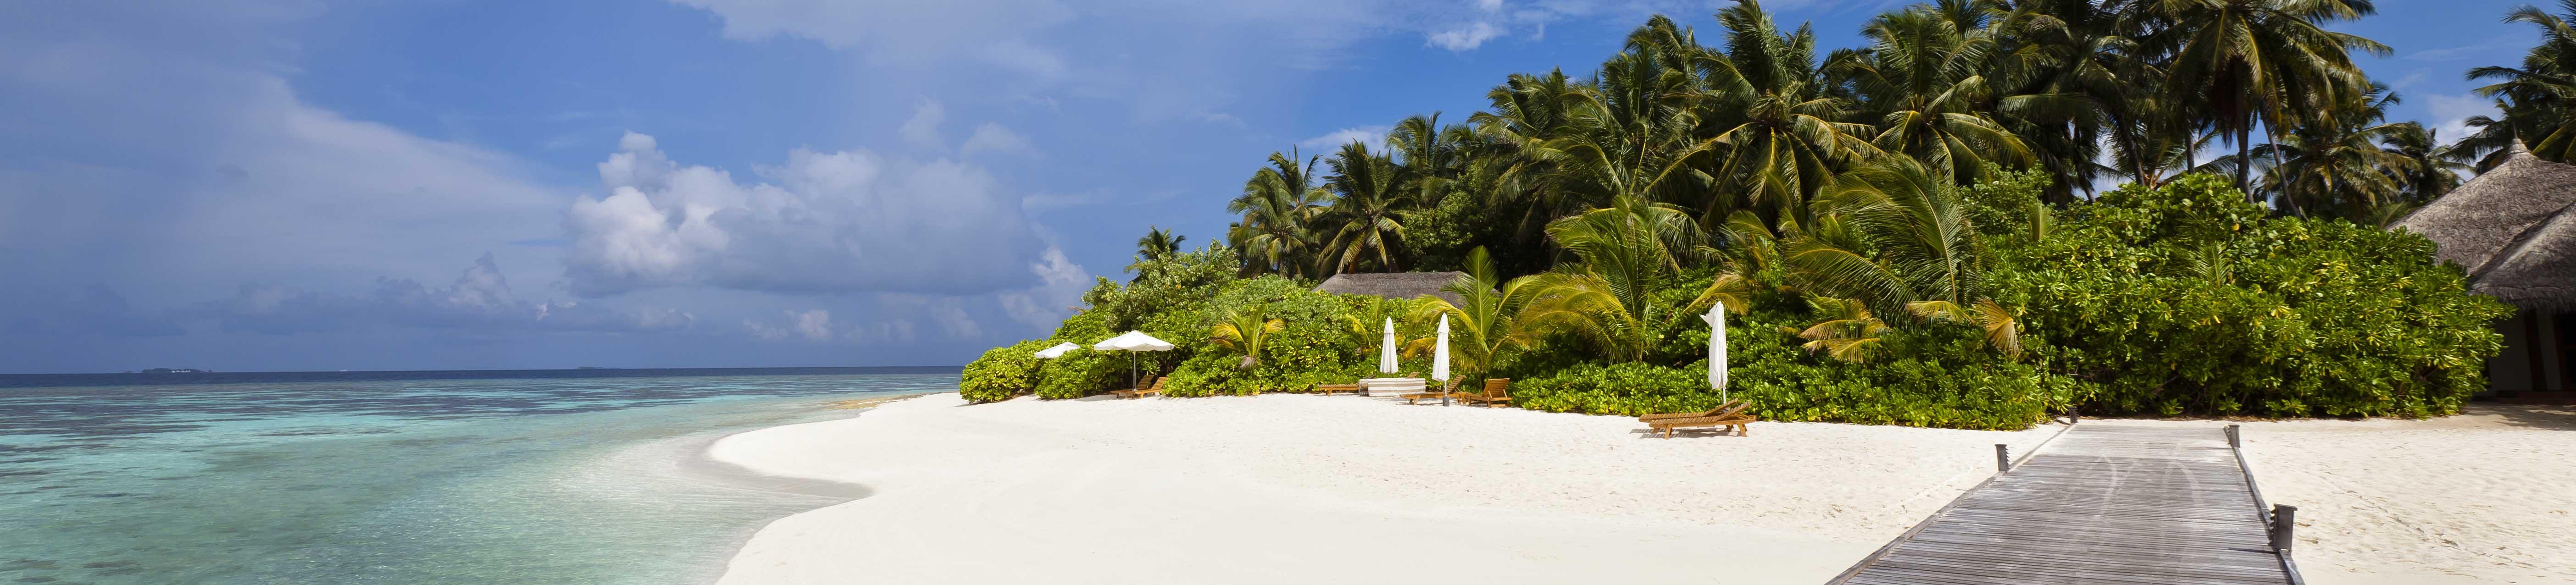 Voyage Bahamas all inclusive